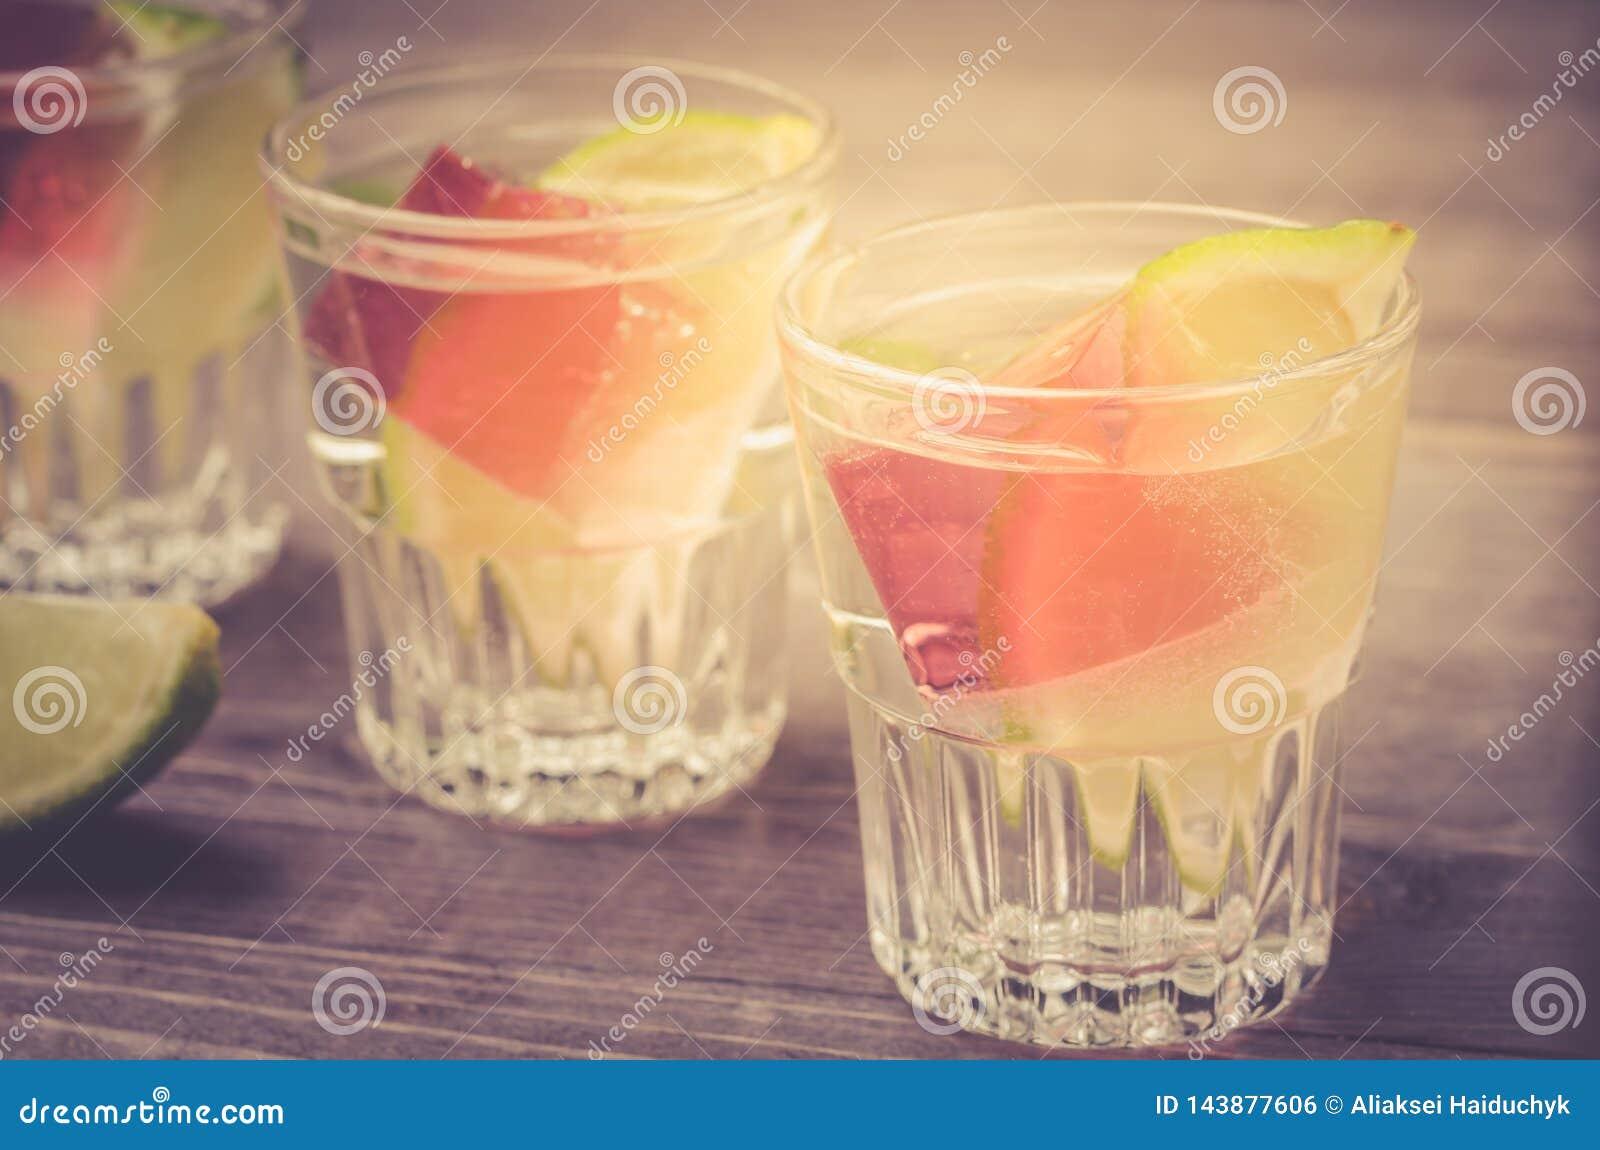 shots with ice and a lime/shots with ice and a lime. selective focus